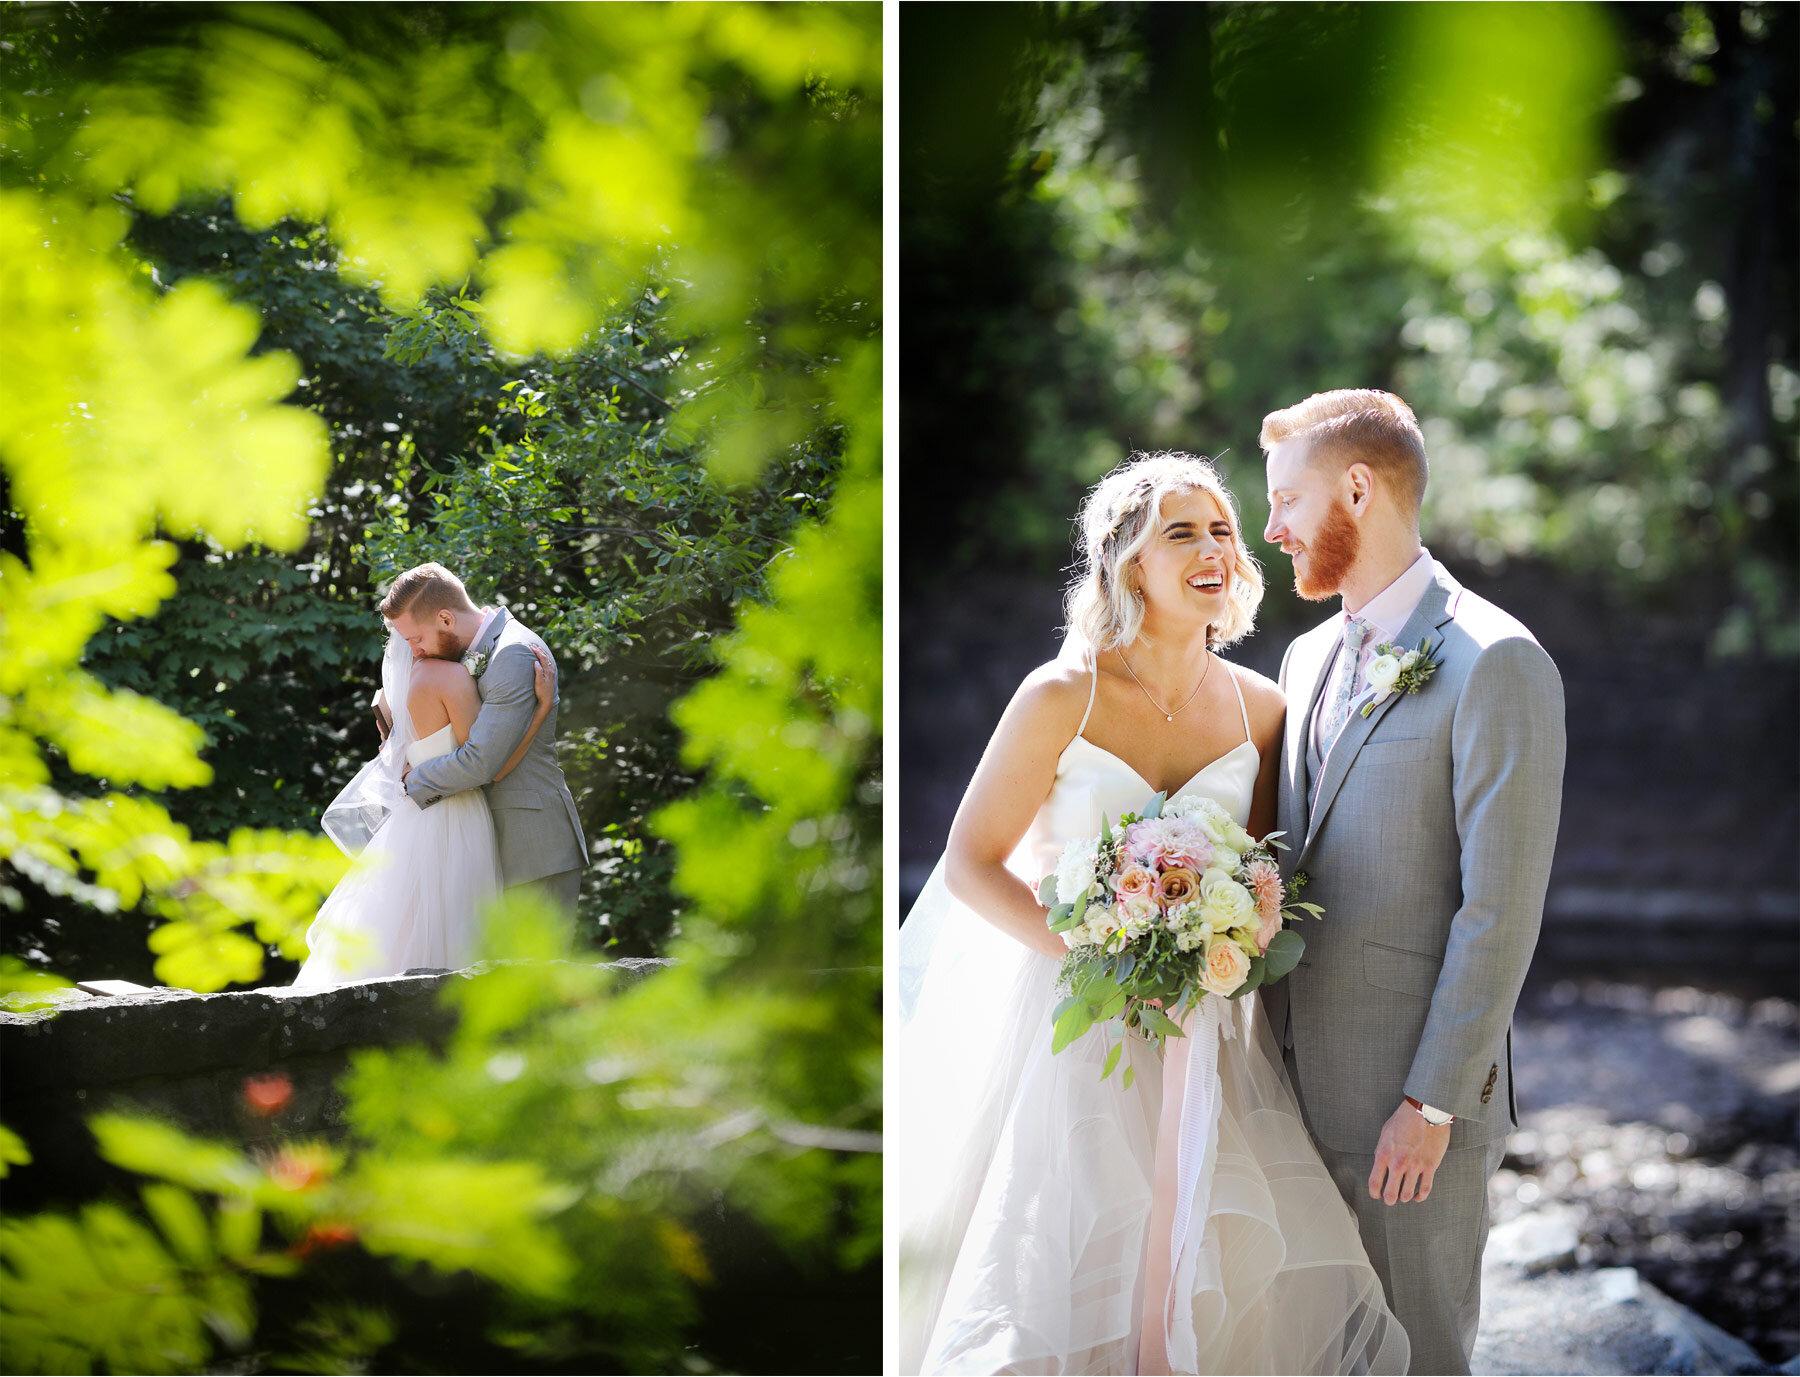 06-Vick-Photography-Wedding-Duluth-Minnesota-Glensheen-Mansion-Groom-Bride-Trees-First-Look-Catherine-and-John.jpg